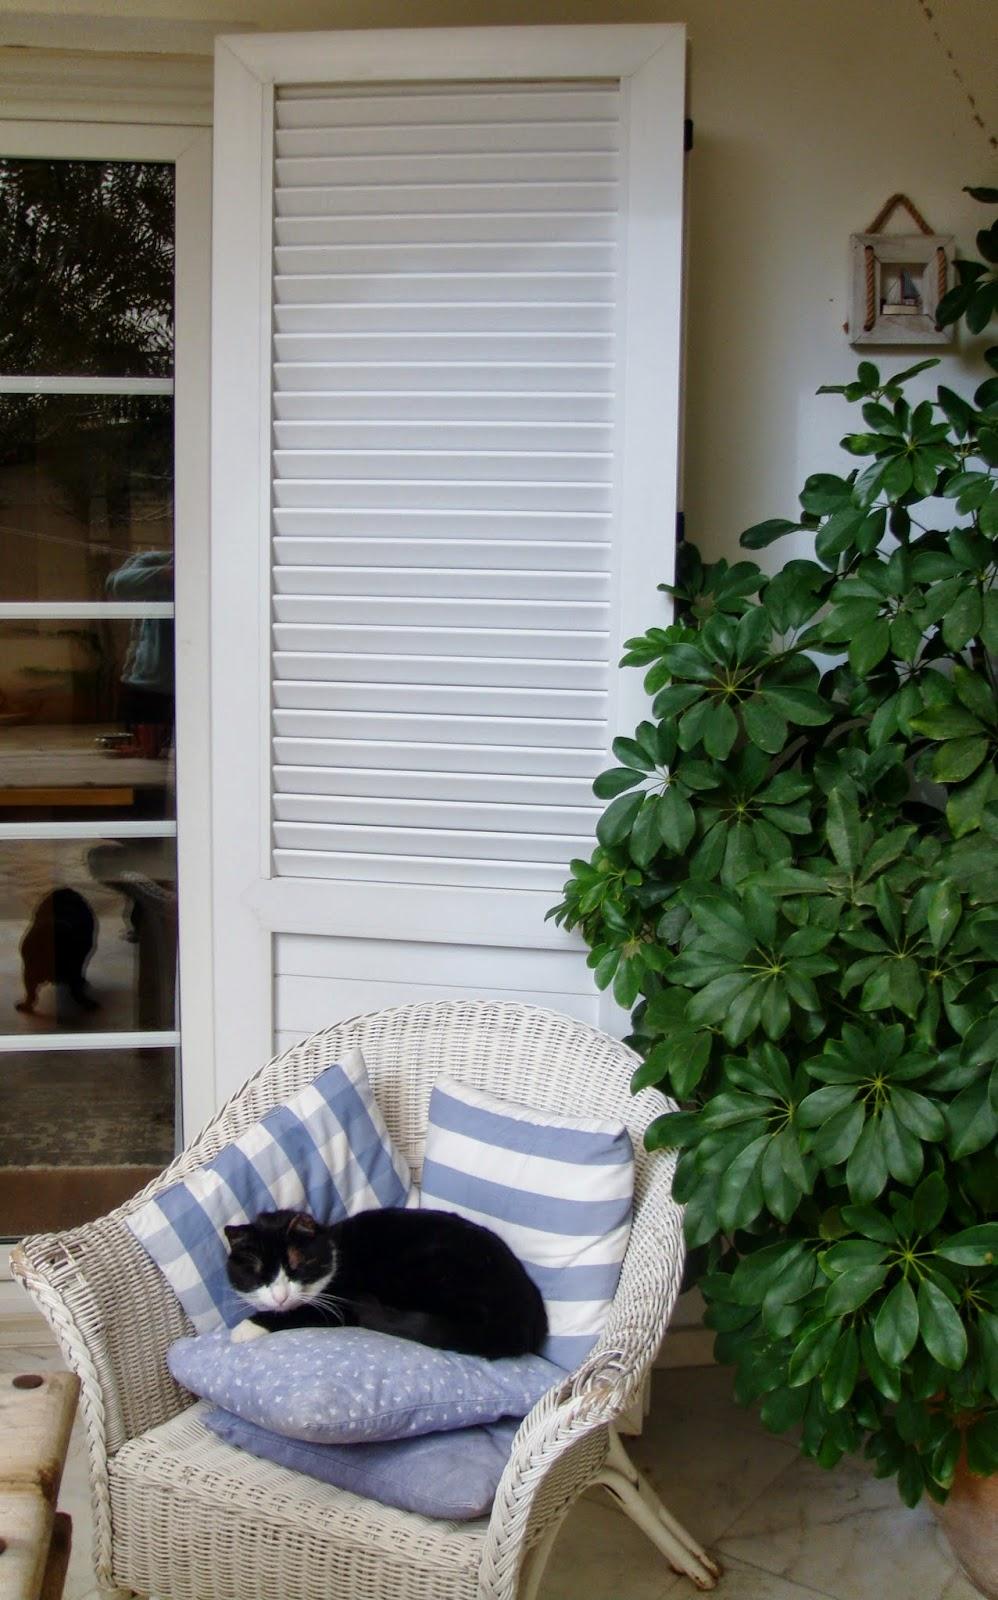 Clean, white shutters